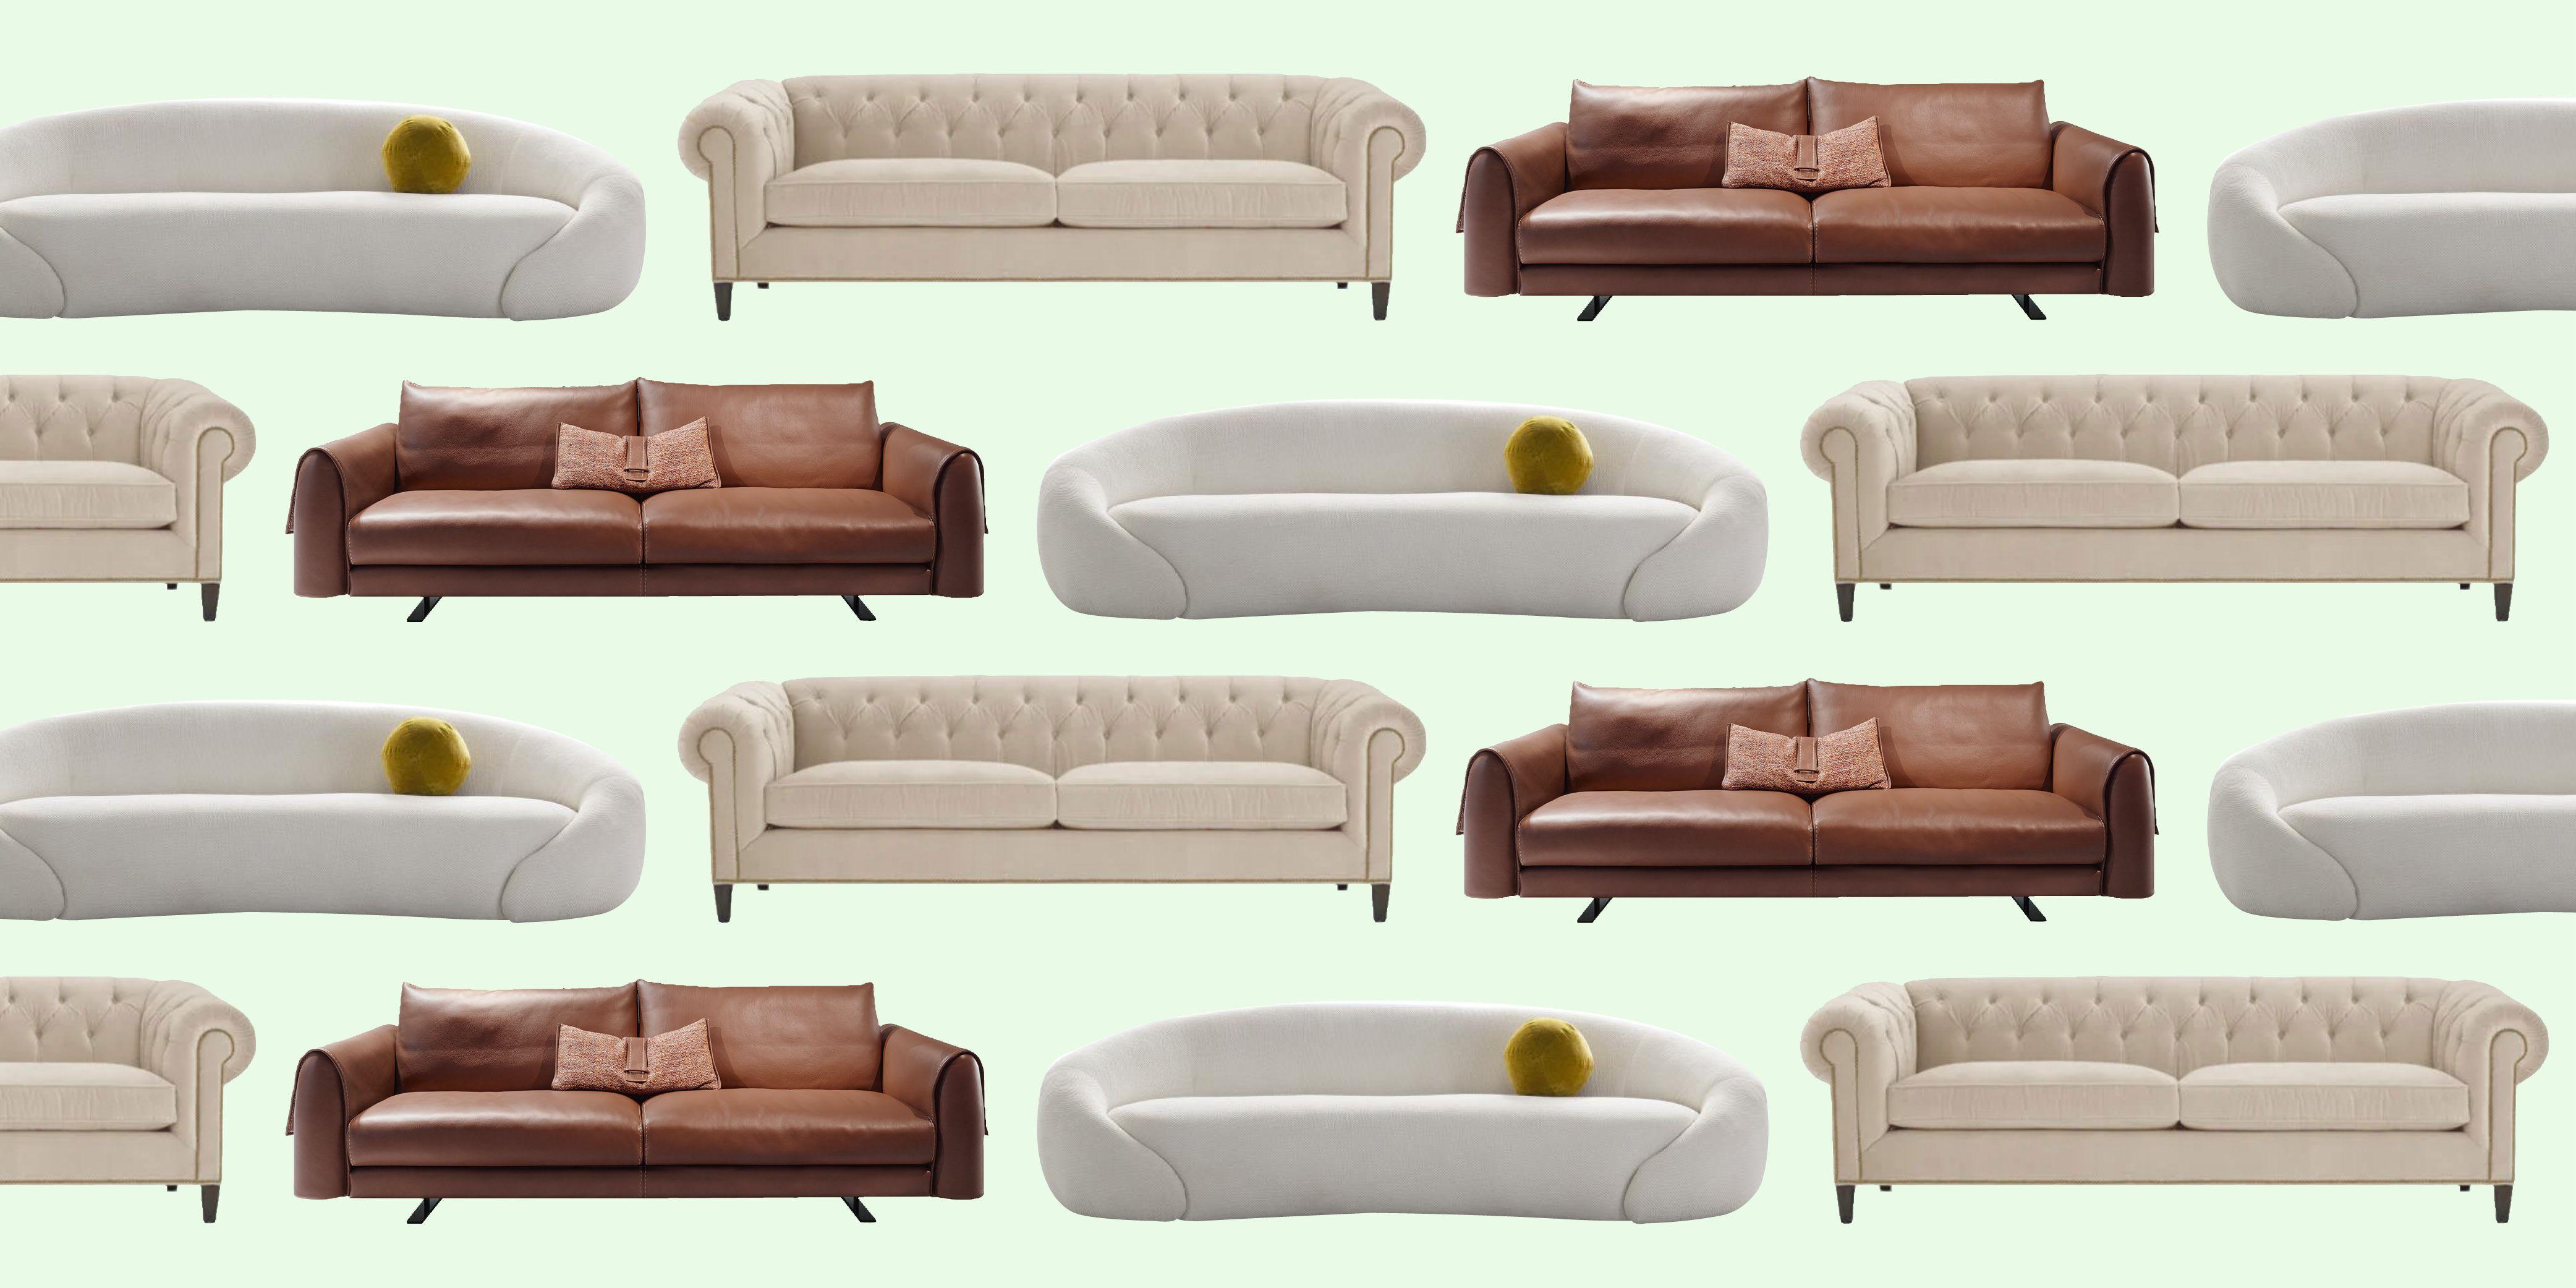 13 Best New Sofas Spring 2020 High